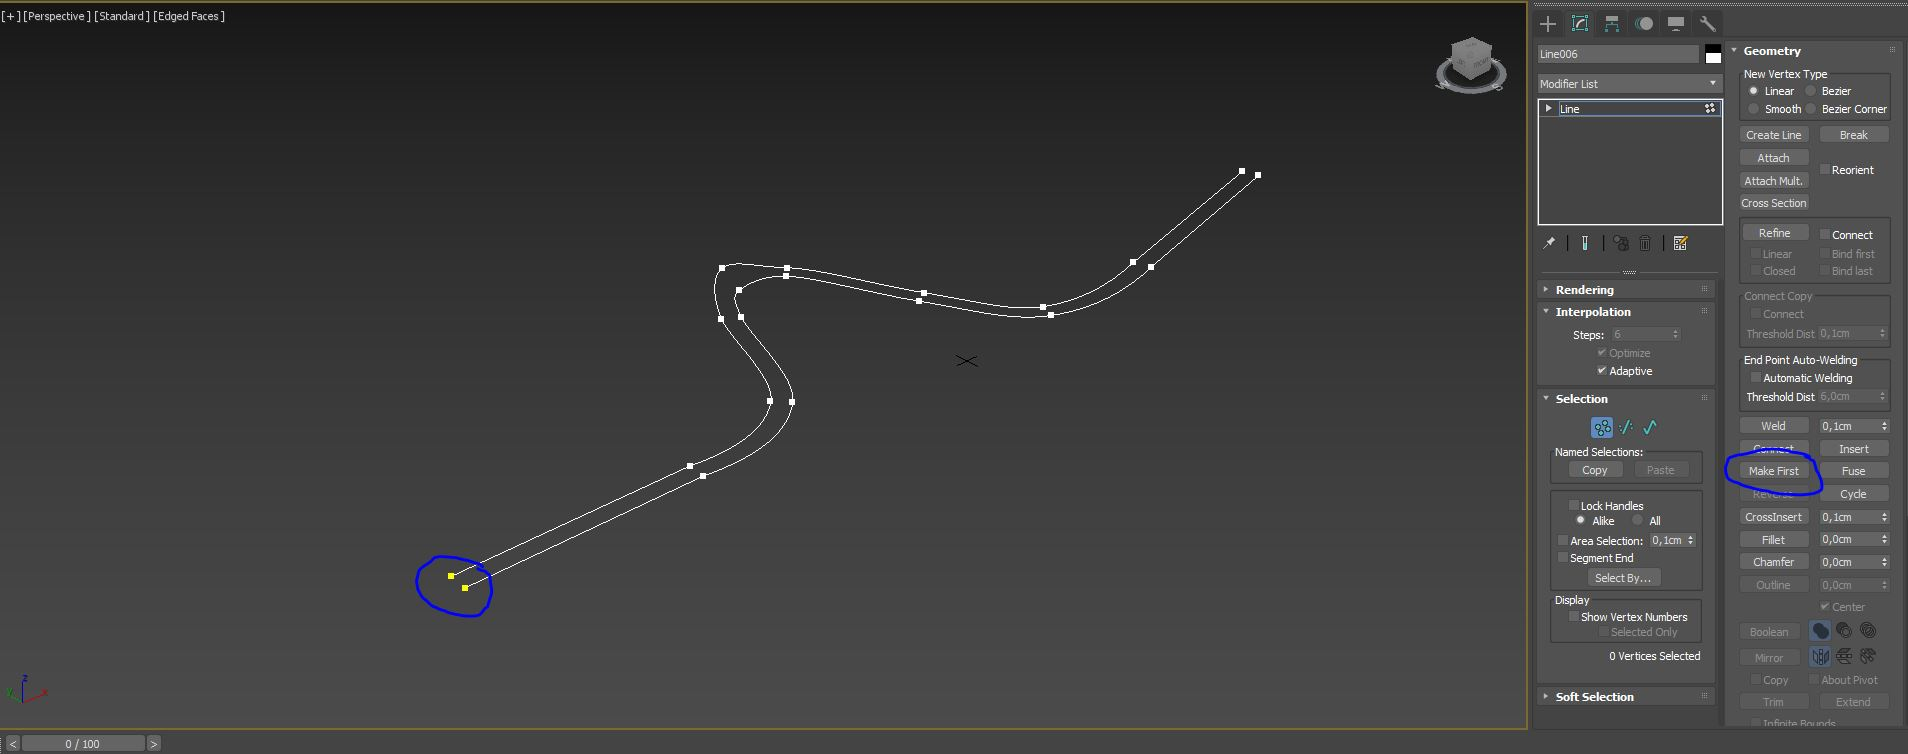 Line_04.JPG.16051f7f2dd7b6a7ba5cce459aa95b9b.JPG